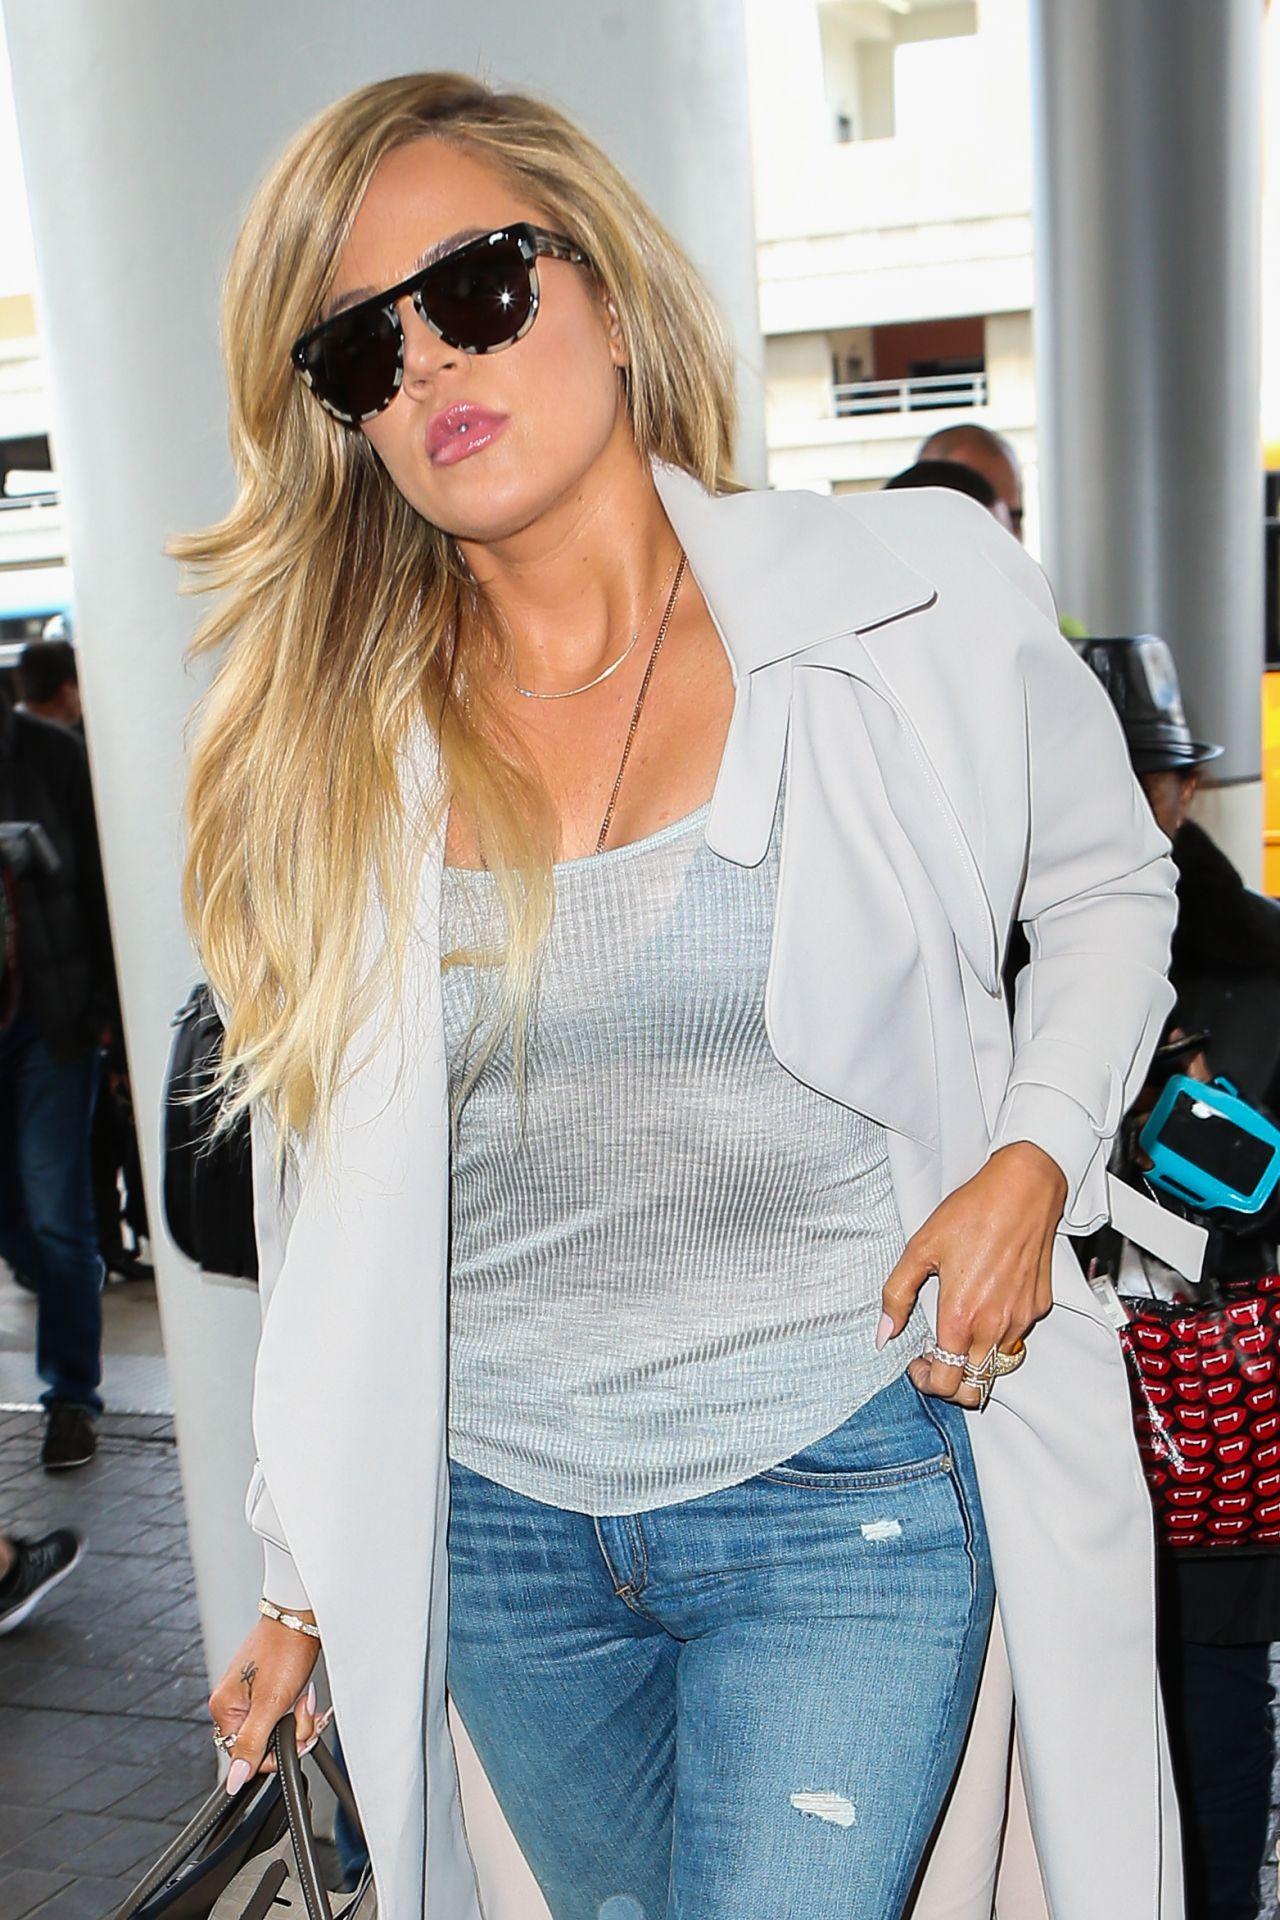 Khloe Kardashian - LAX Airport in LA, April 2015